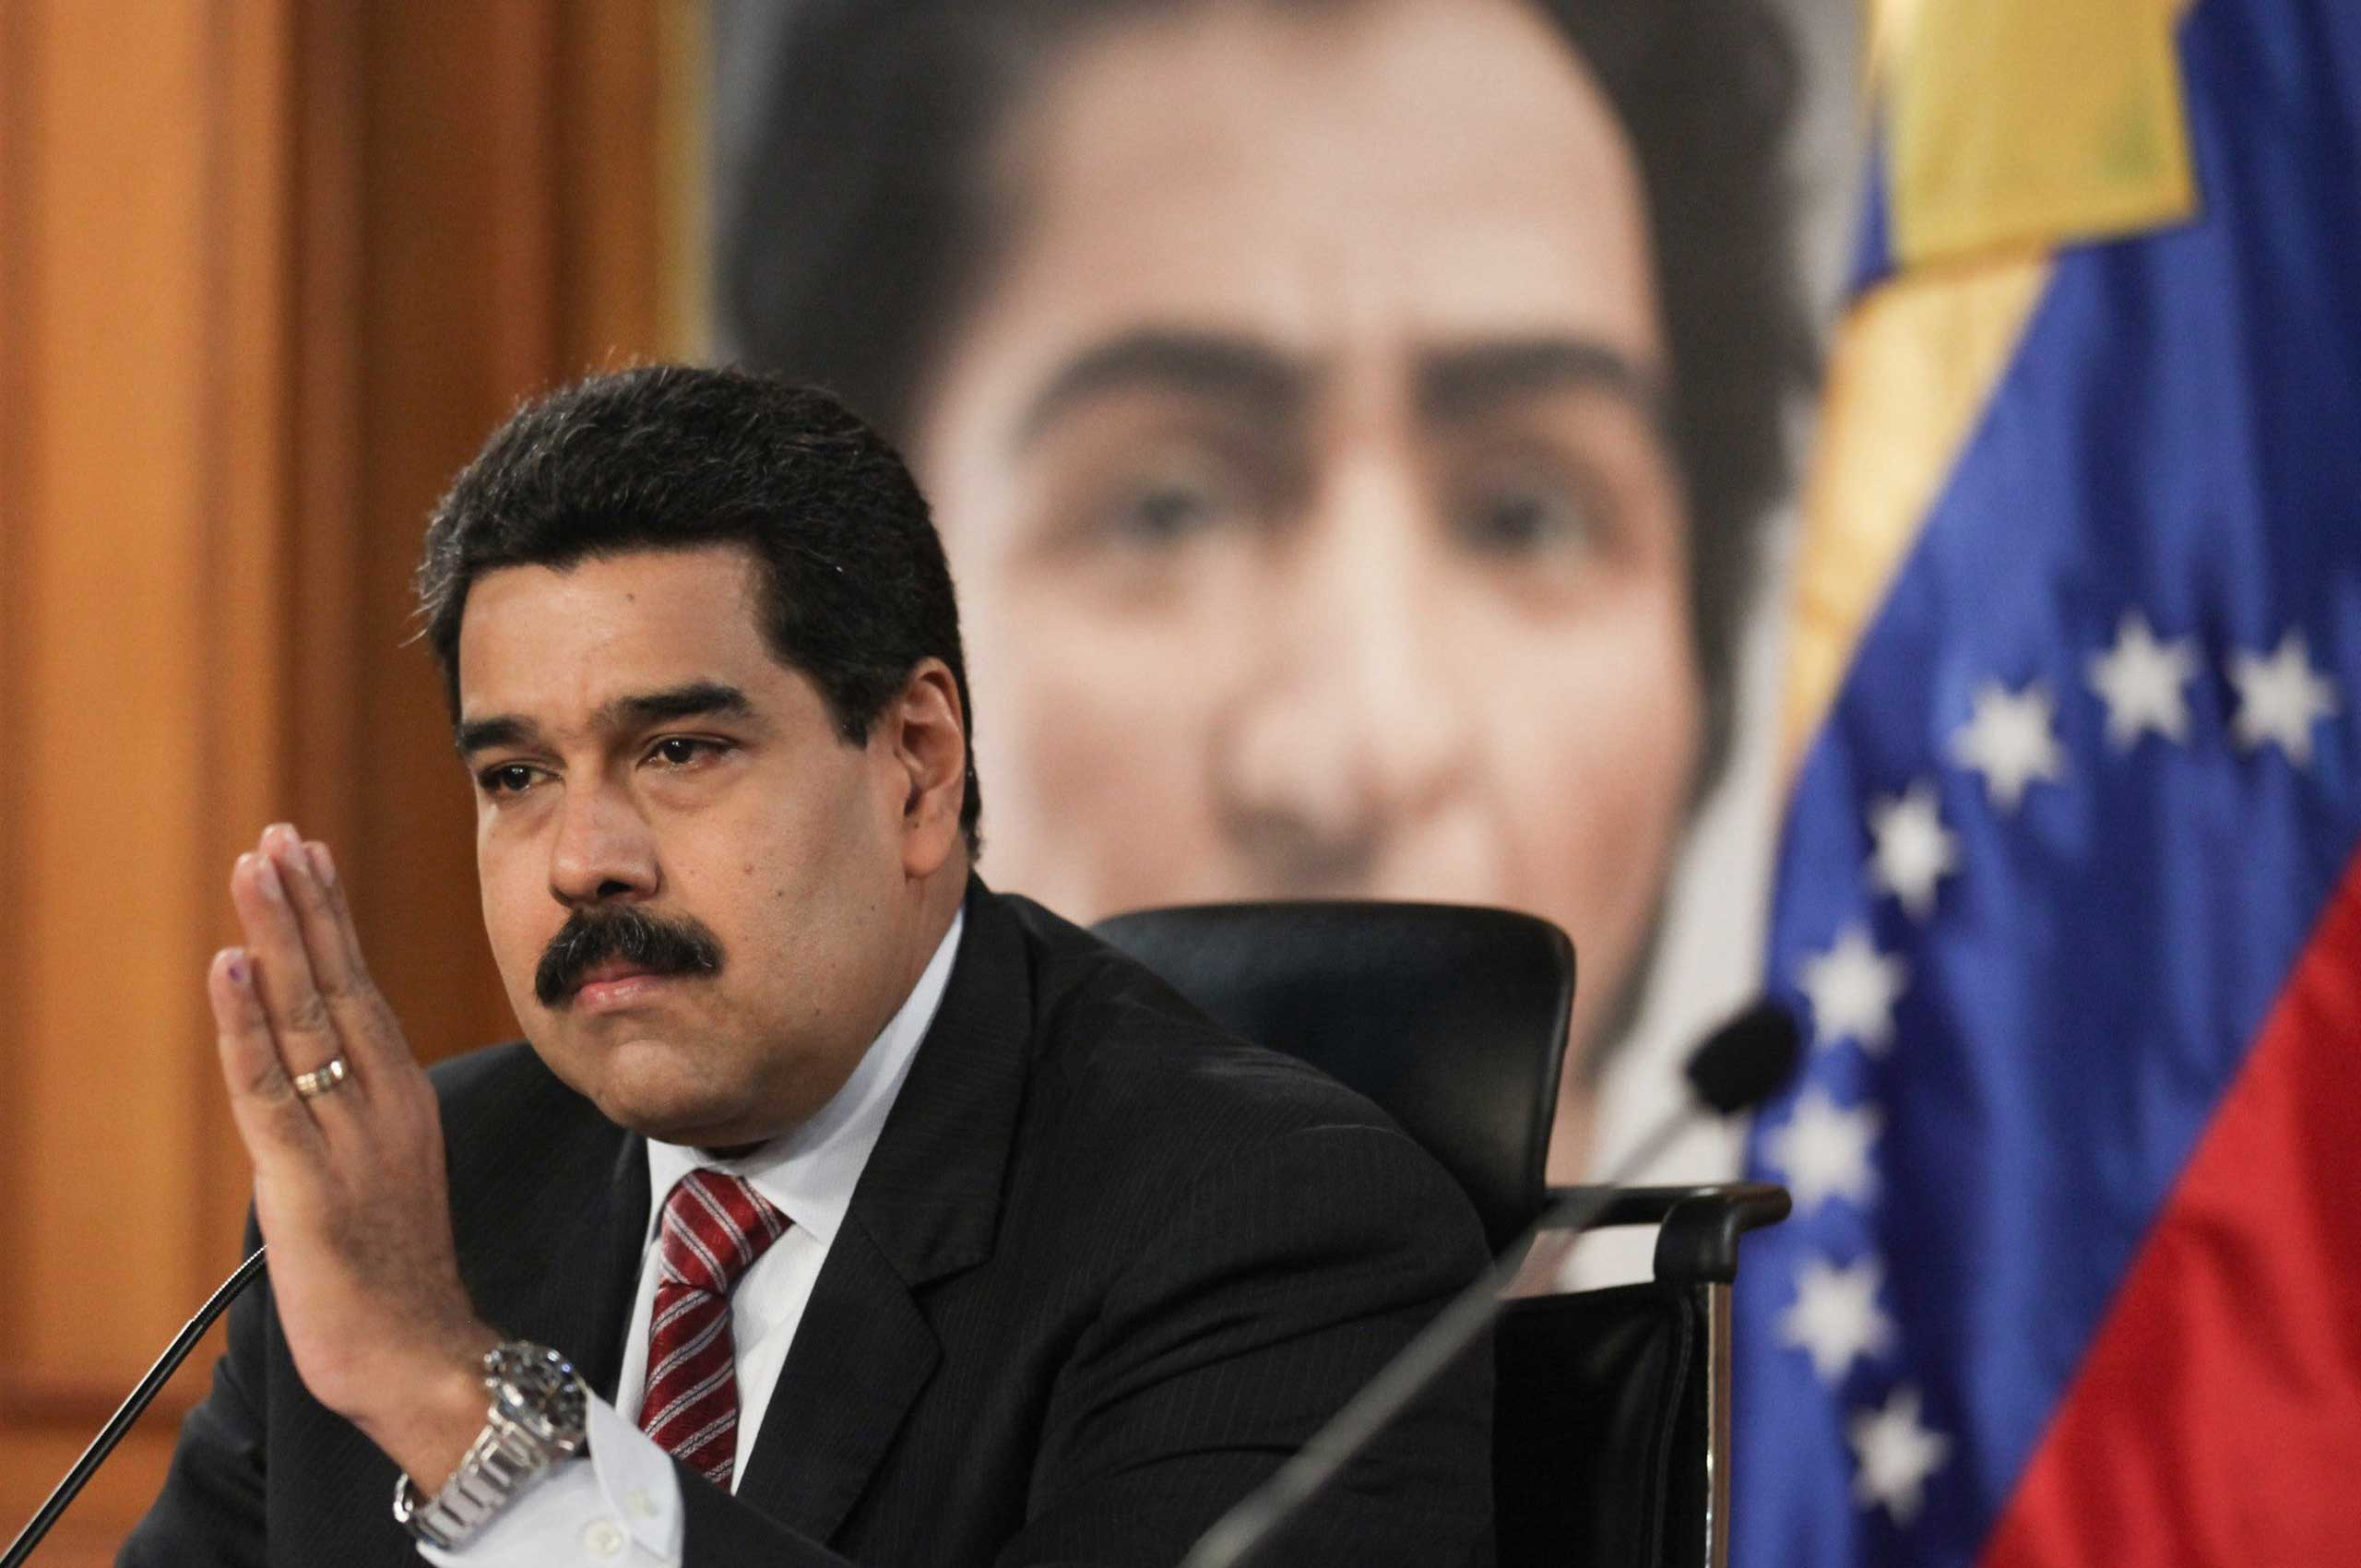 President Nicolas Maduro takes part in a press conference in Caracas, Venezuela, on Dec. 2, 2014.